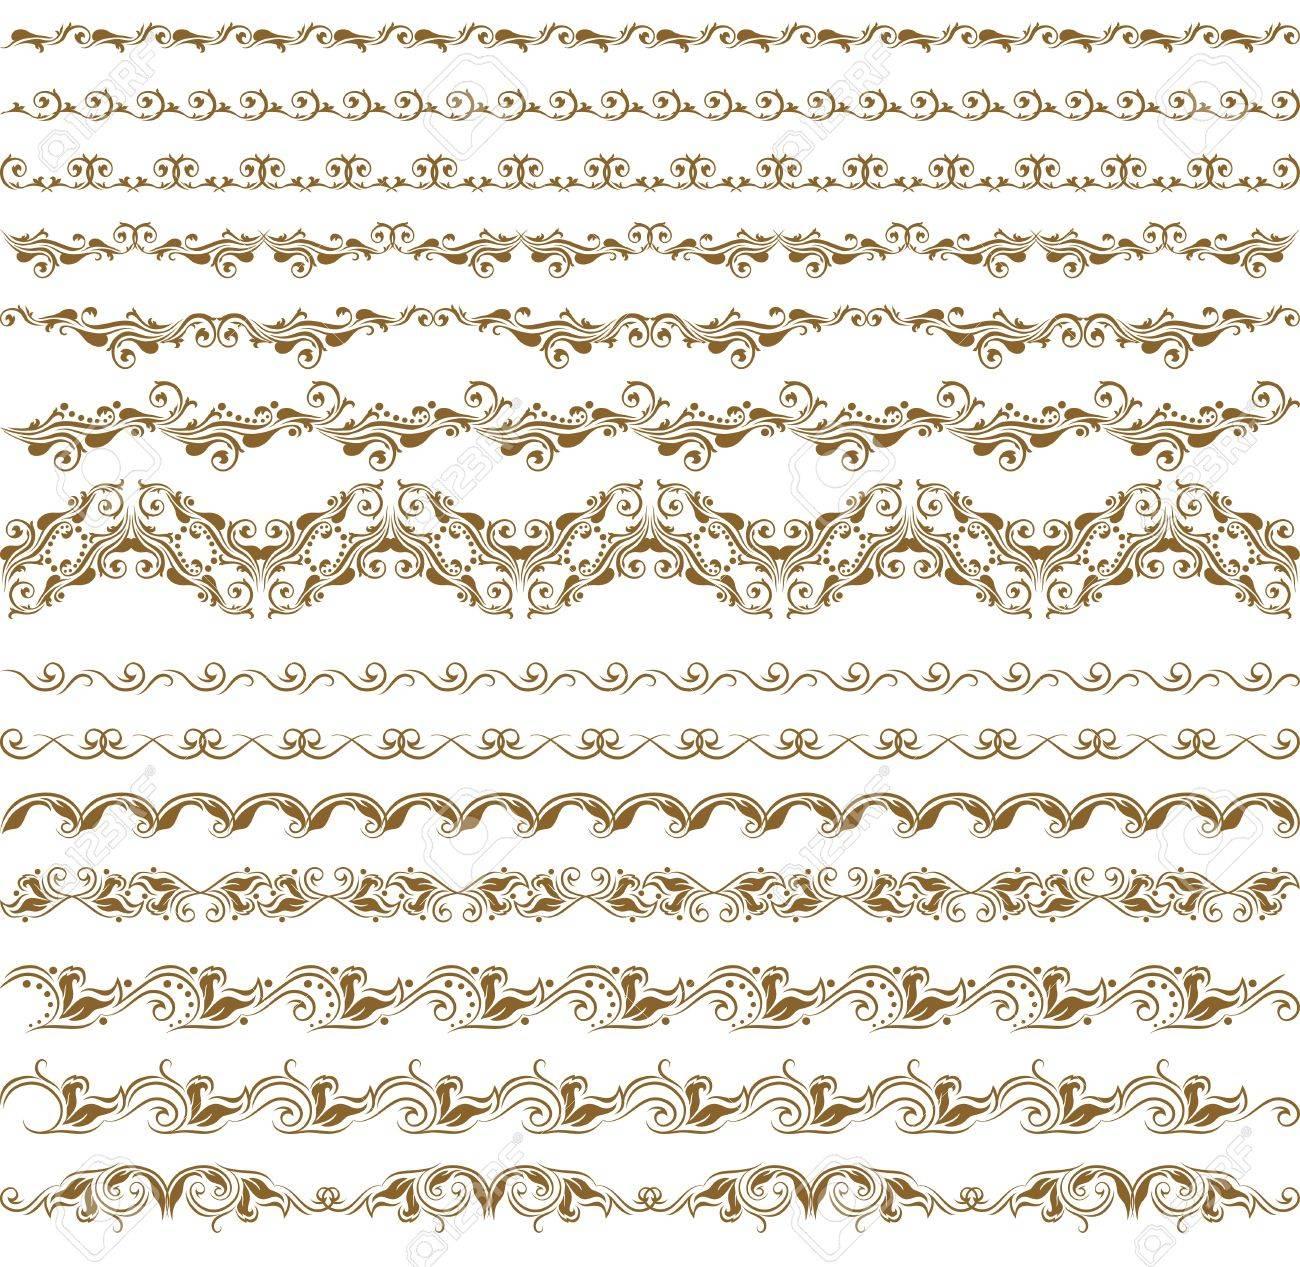 Horizontal elements decoration vector Stock Vector - 12776614